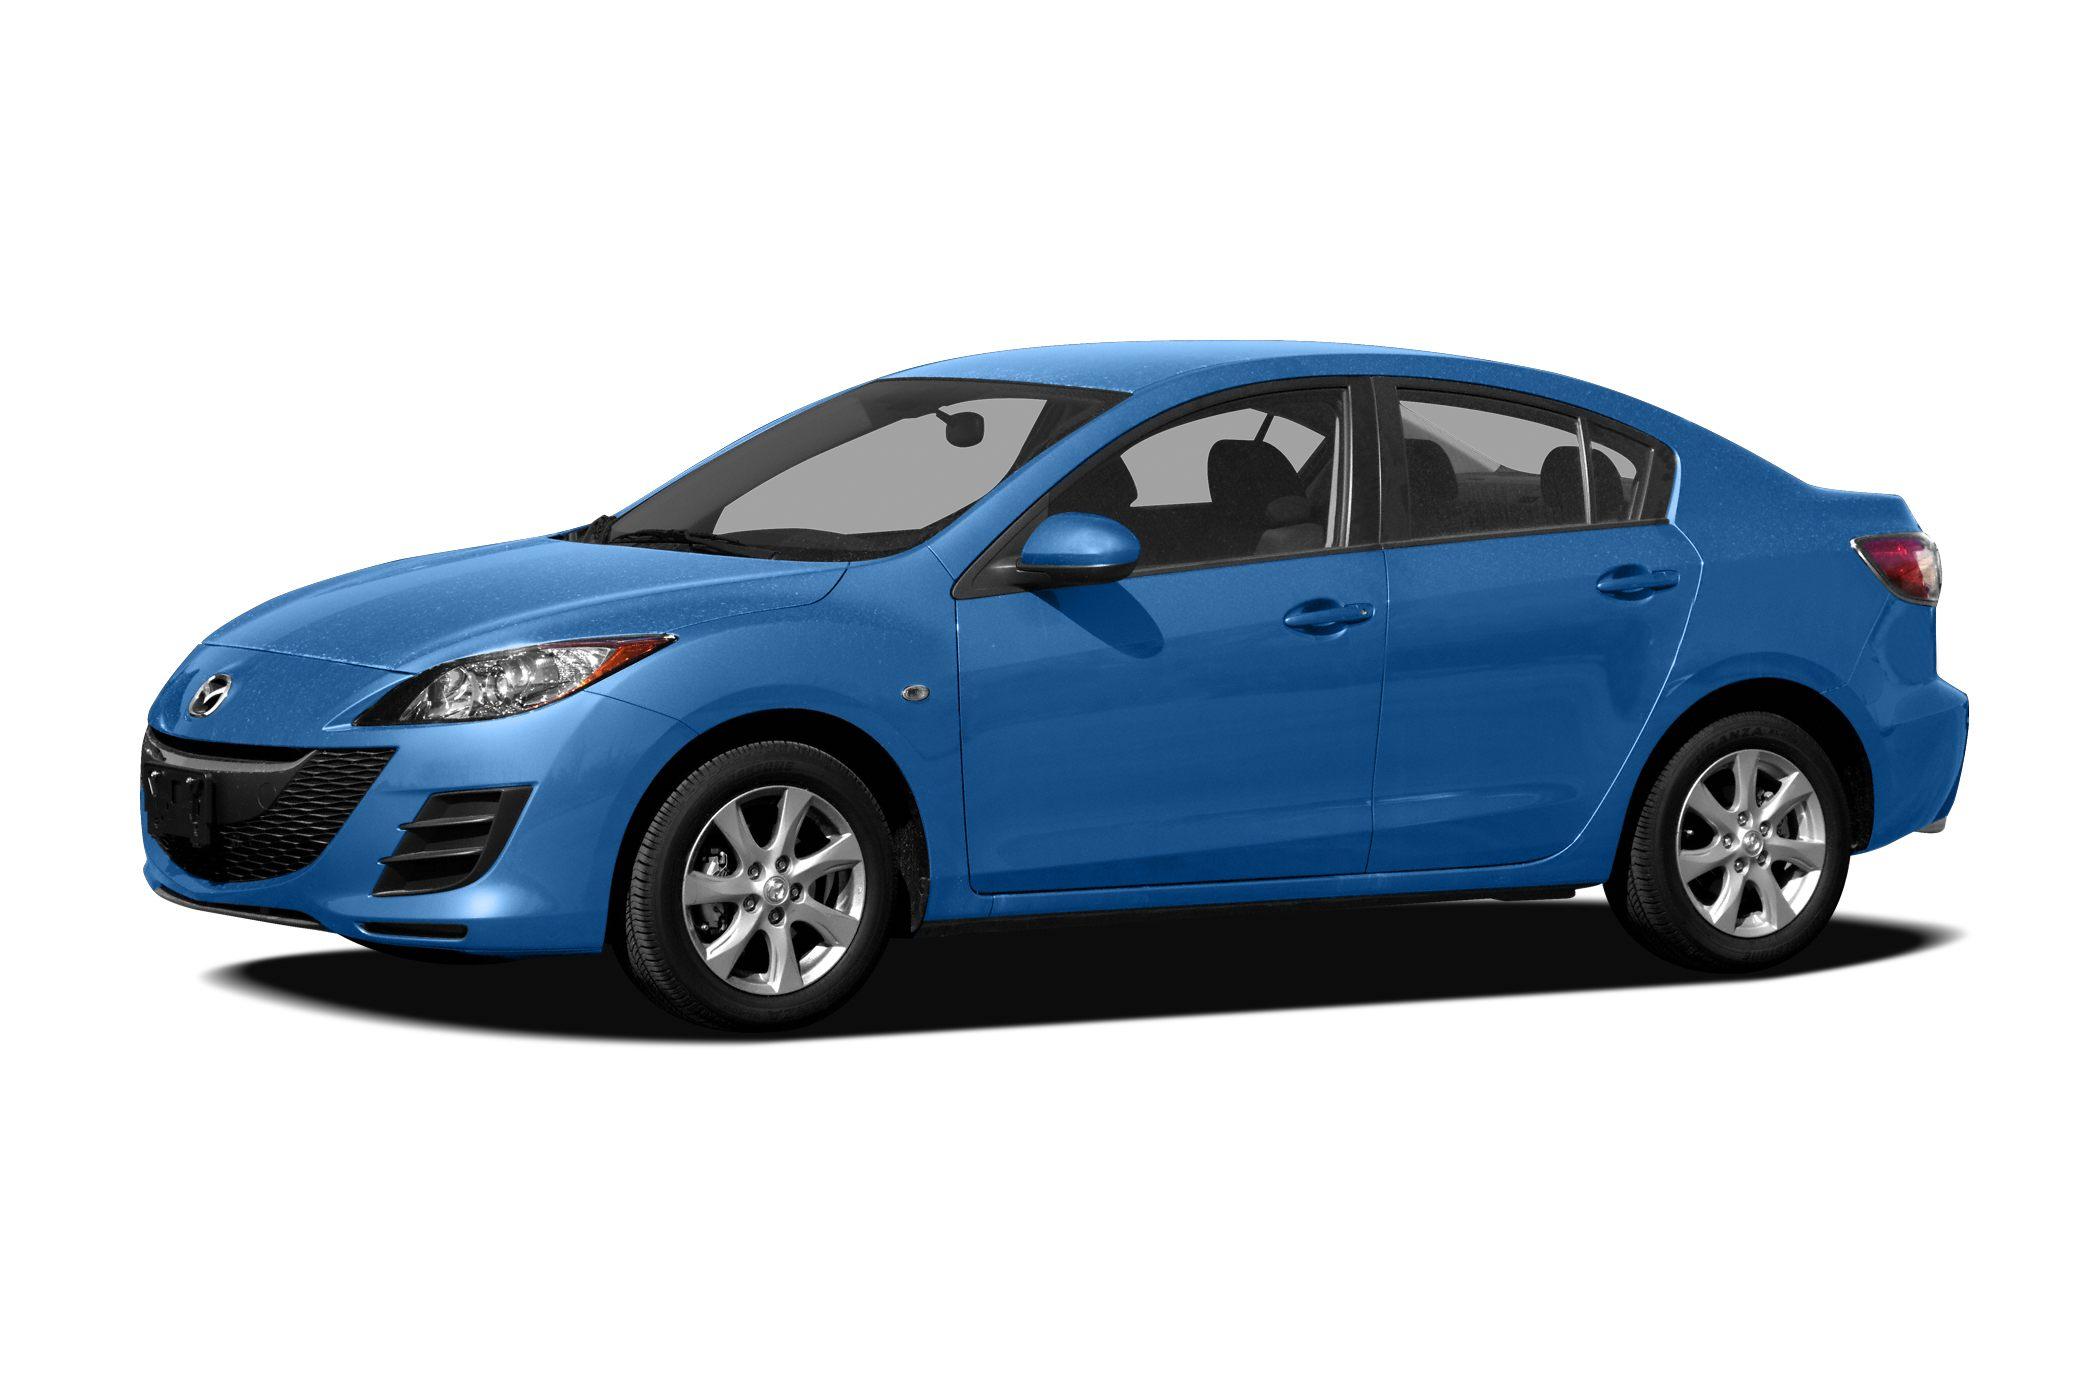 2010 mazda mazda3 information rh autoblog com Custom 2010 Mazda 3 2010 Mazda 3 Black